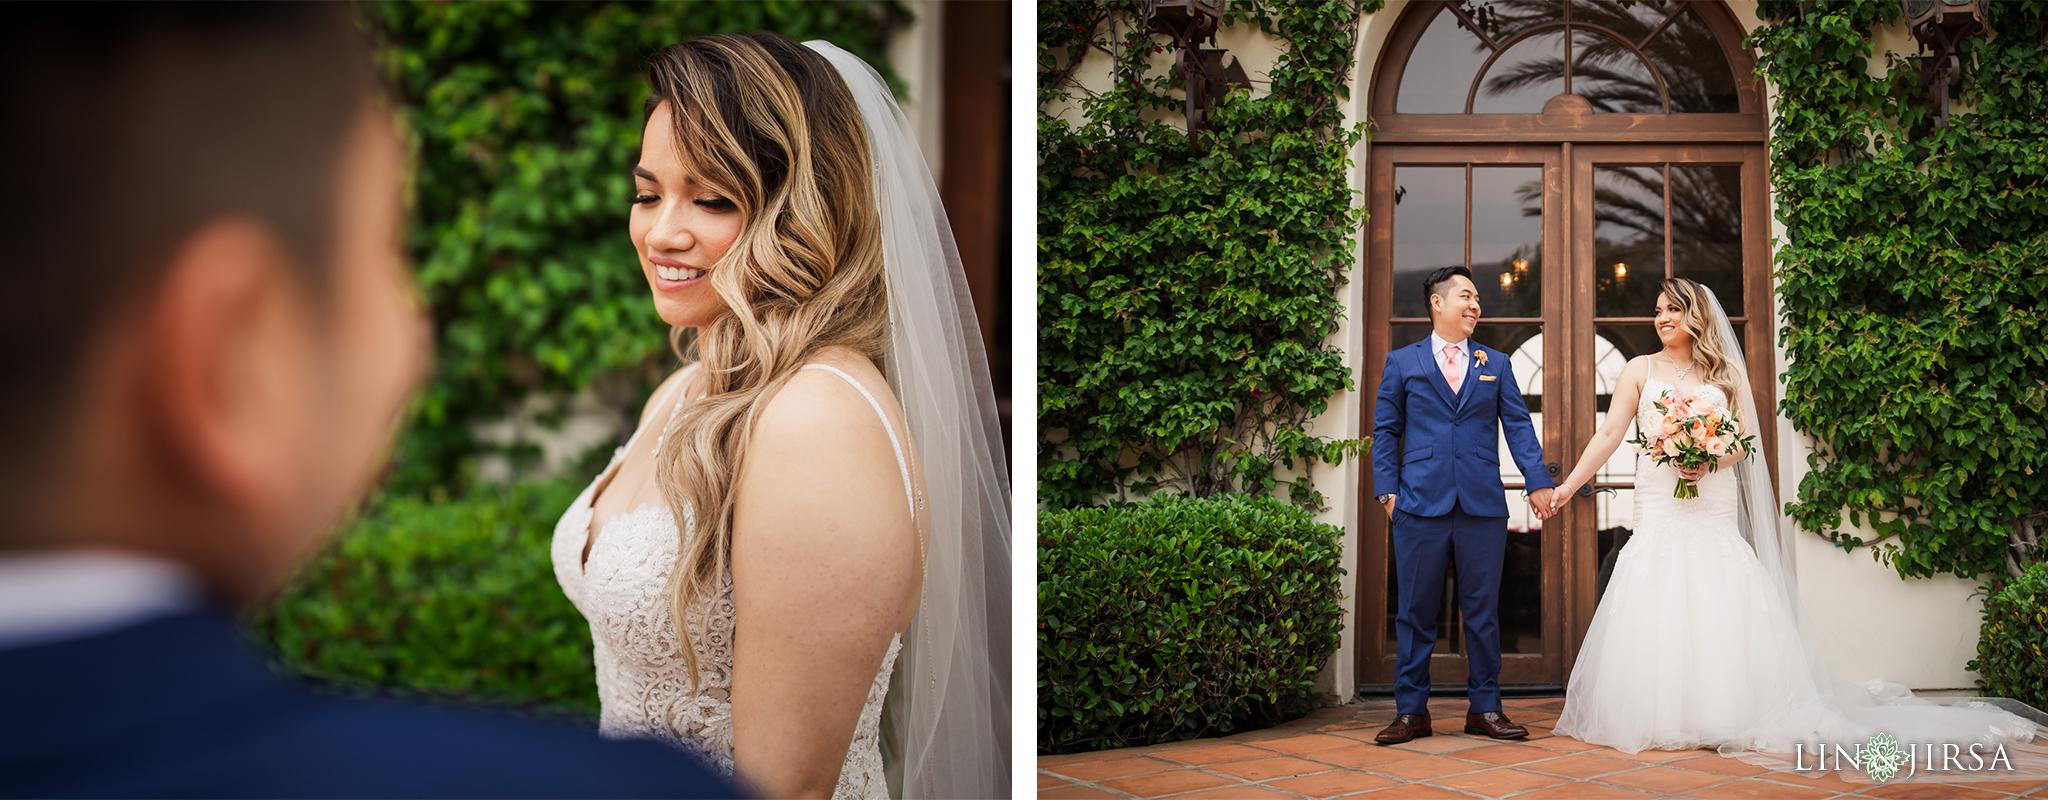 18 Hummingbird Nest Ranch Santa Susana Wedding Photography